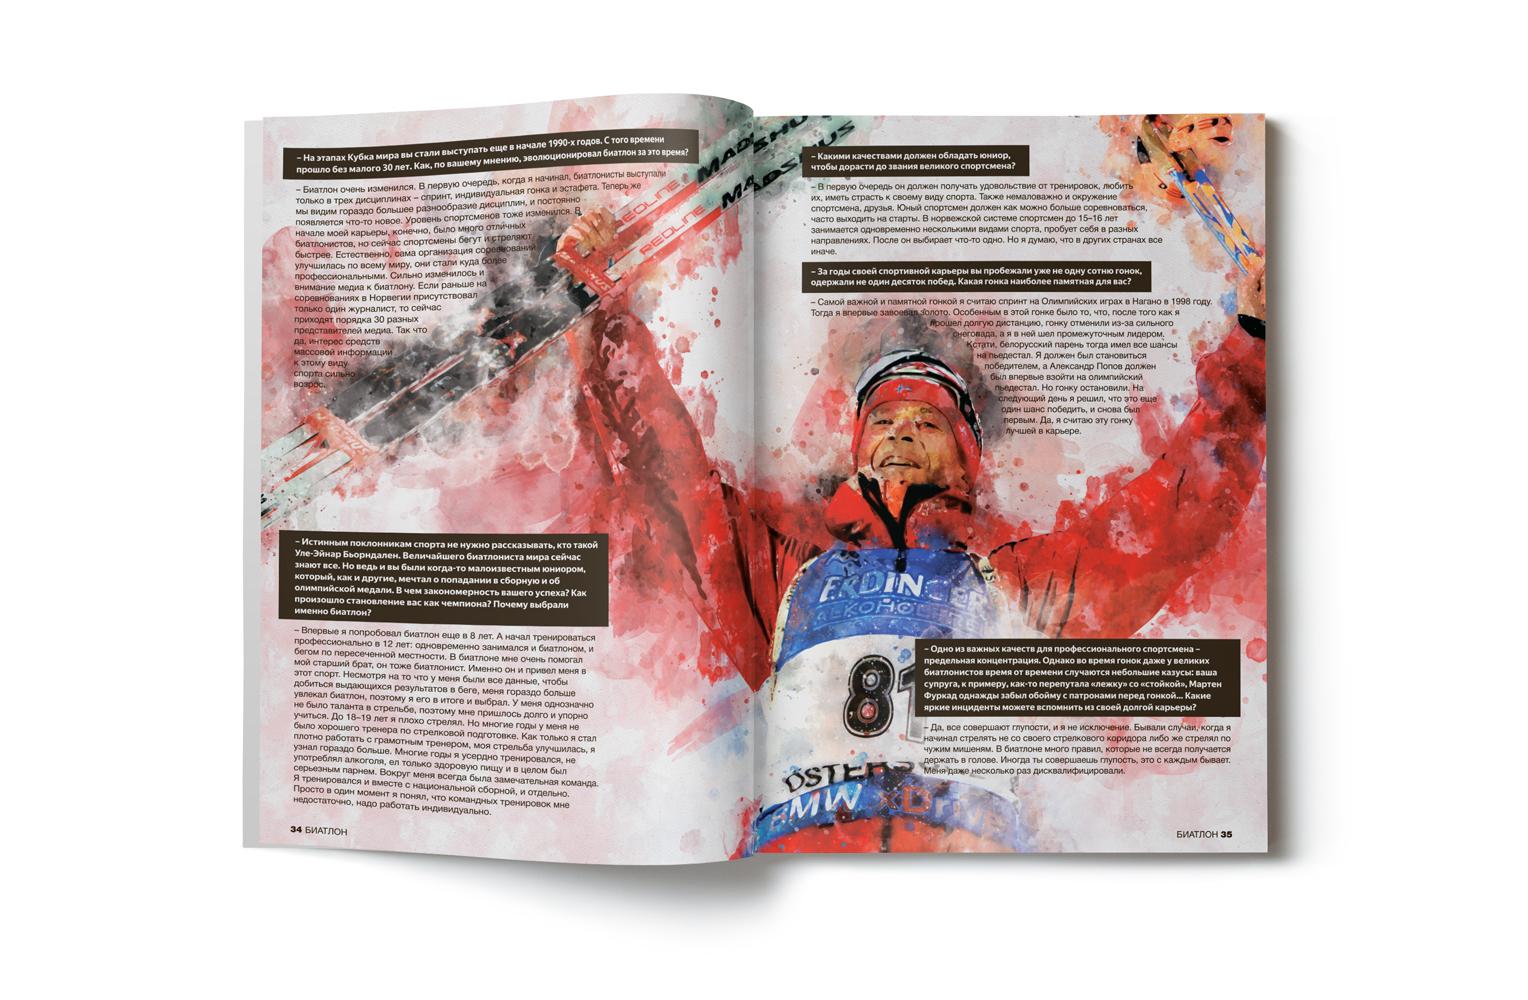 biathlon-magazine-pages-3